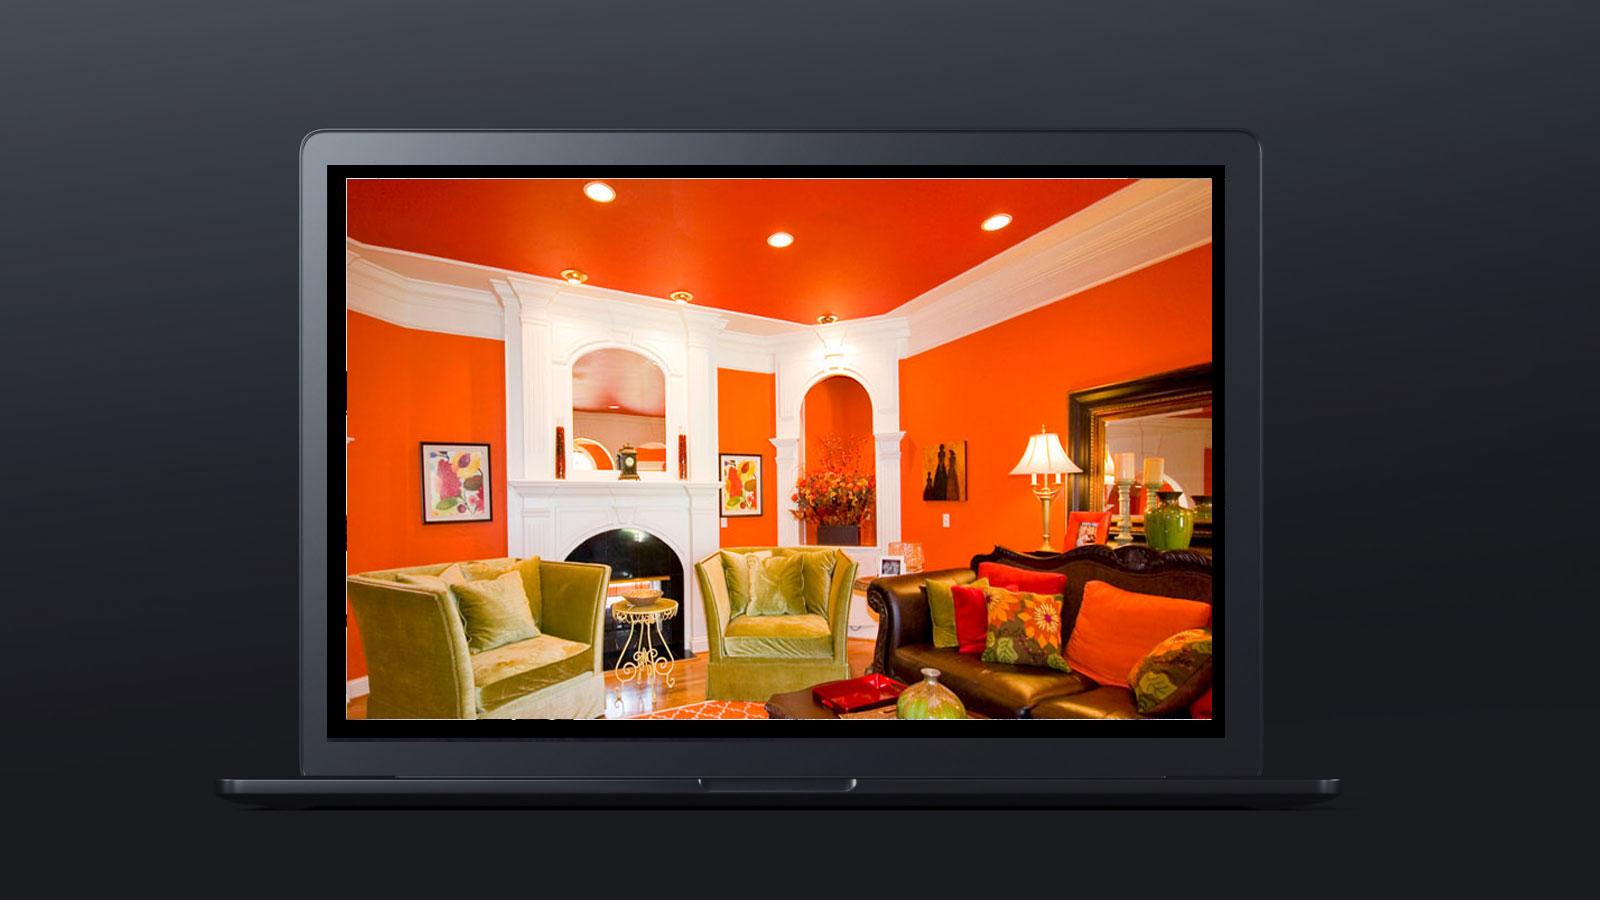 Design Color 14 - نقش رنگ و رنگ آمیزی در دکوراسیون داخلی